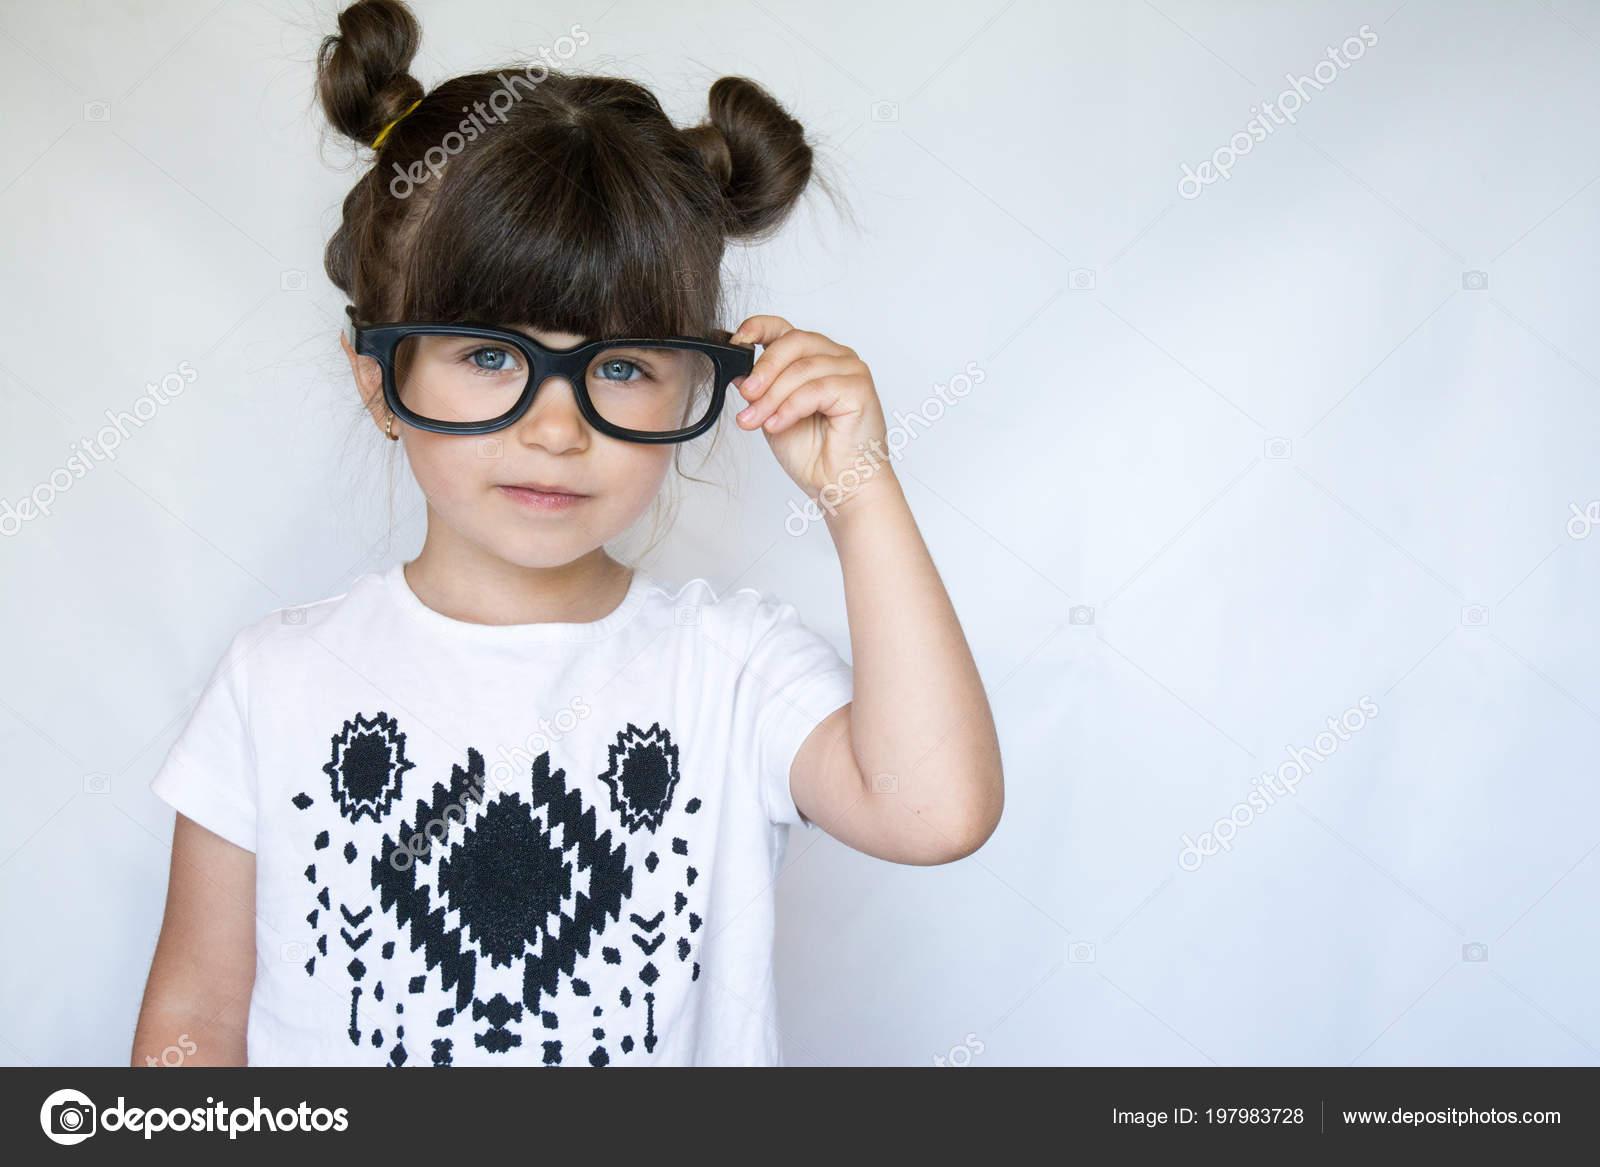 Stylish Girl Glasses Happy Small Brunette Kid Blue Eyes Looking